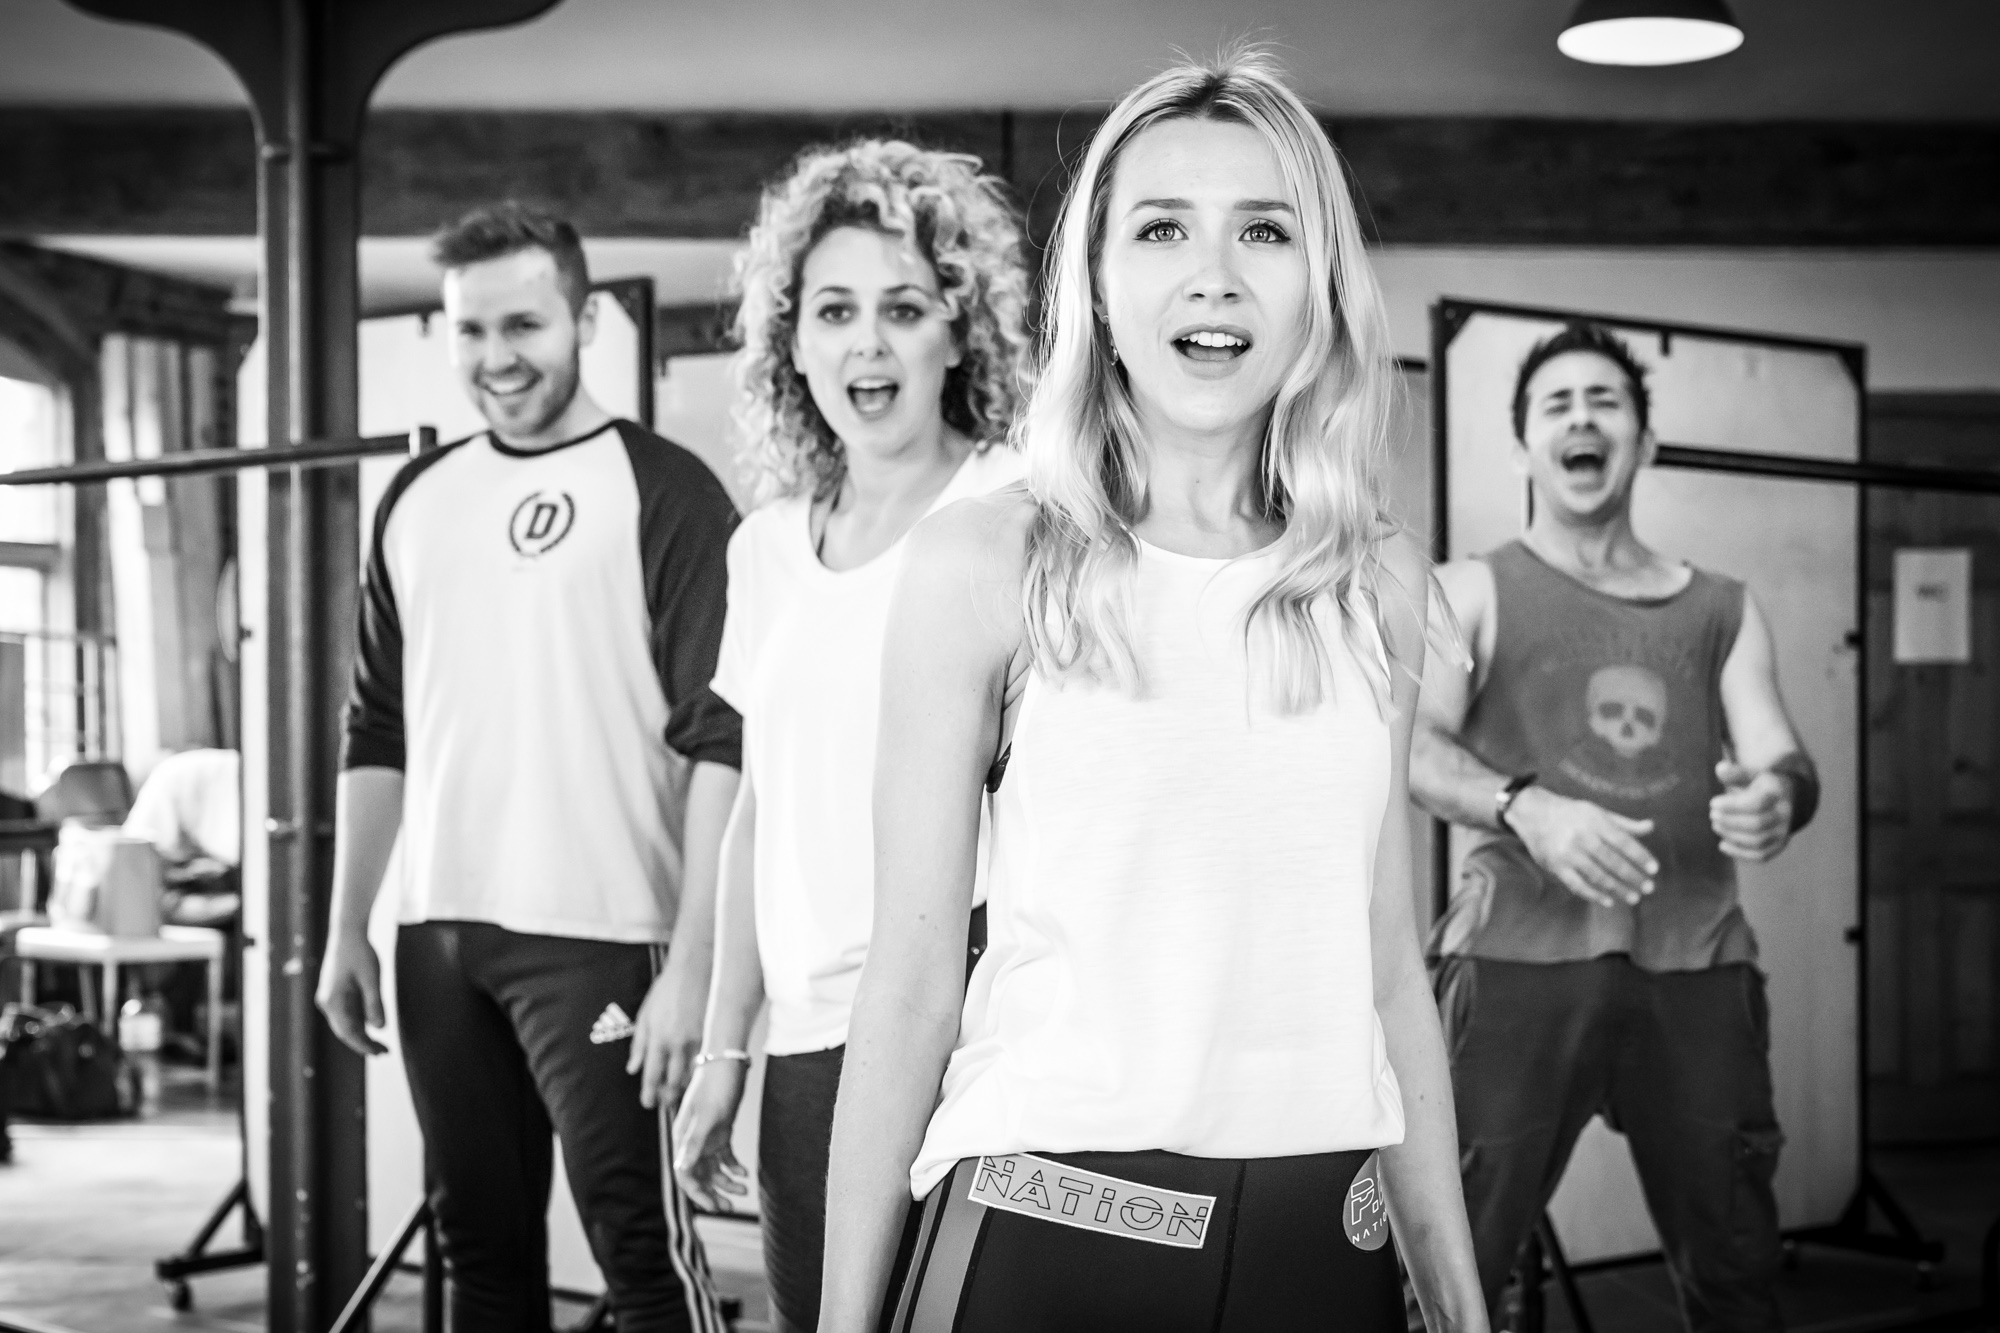 Mythic • Charing Cross Theatre • Dir. Sarah O'Gleby